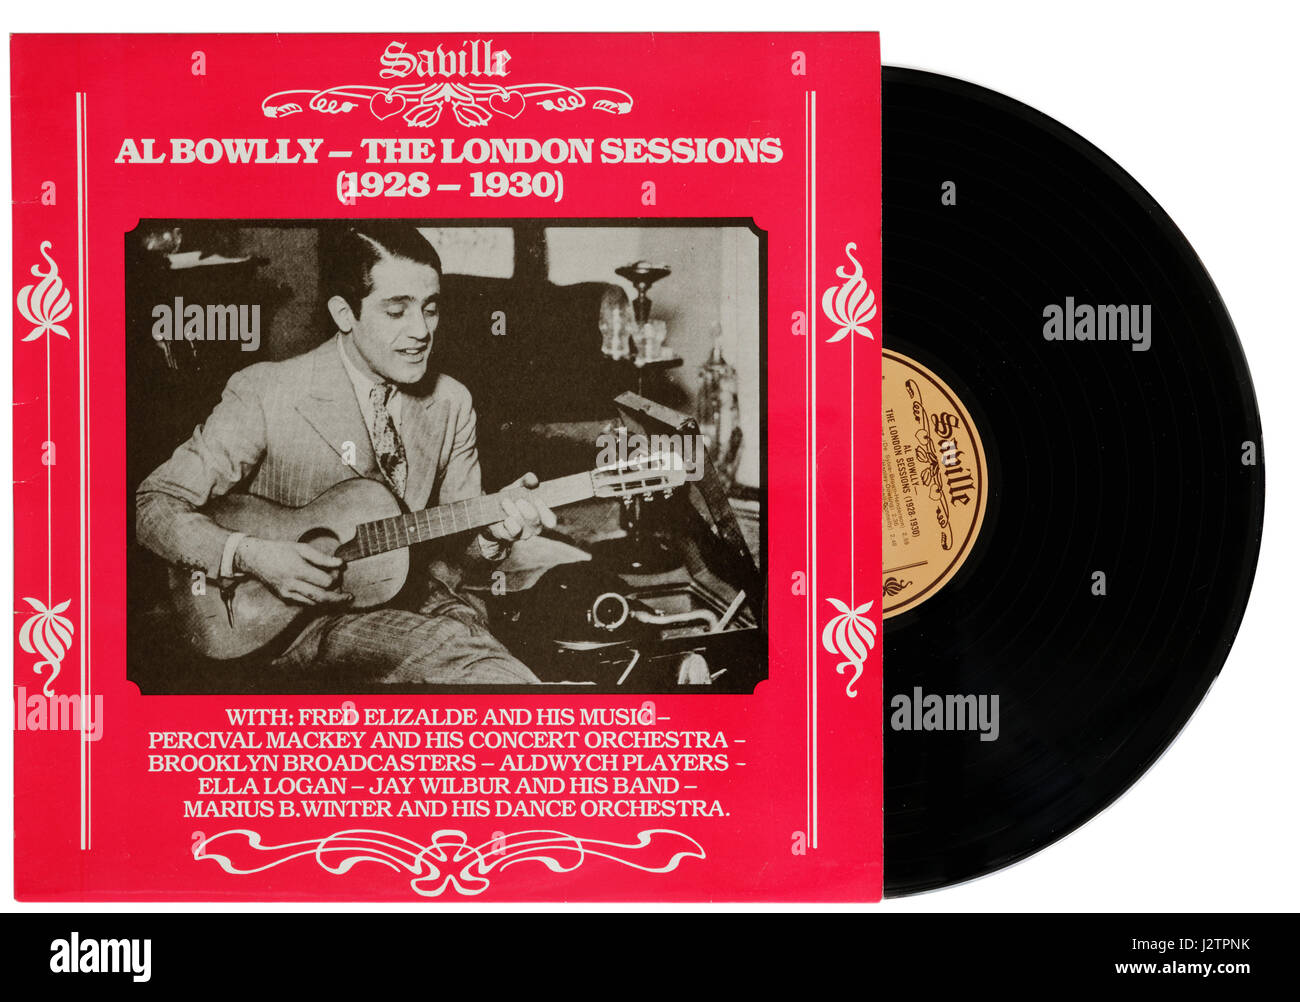 Al Bowly album London Sessions on vinyl - Stock Image